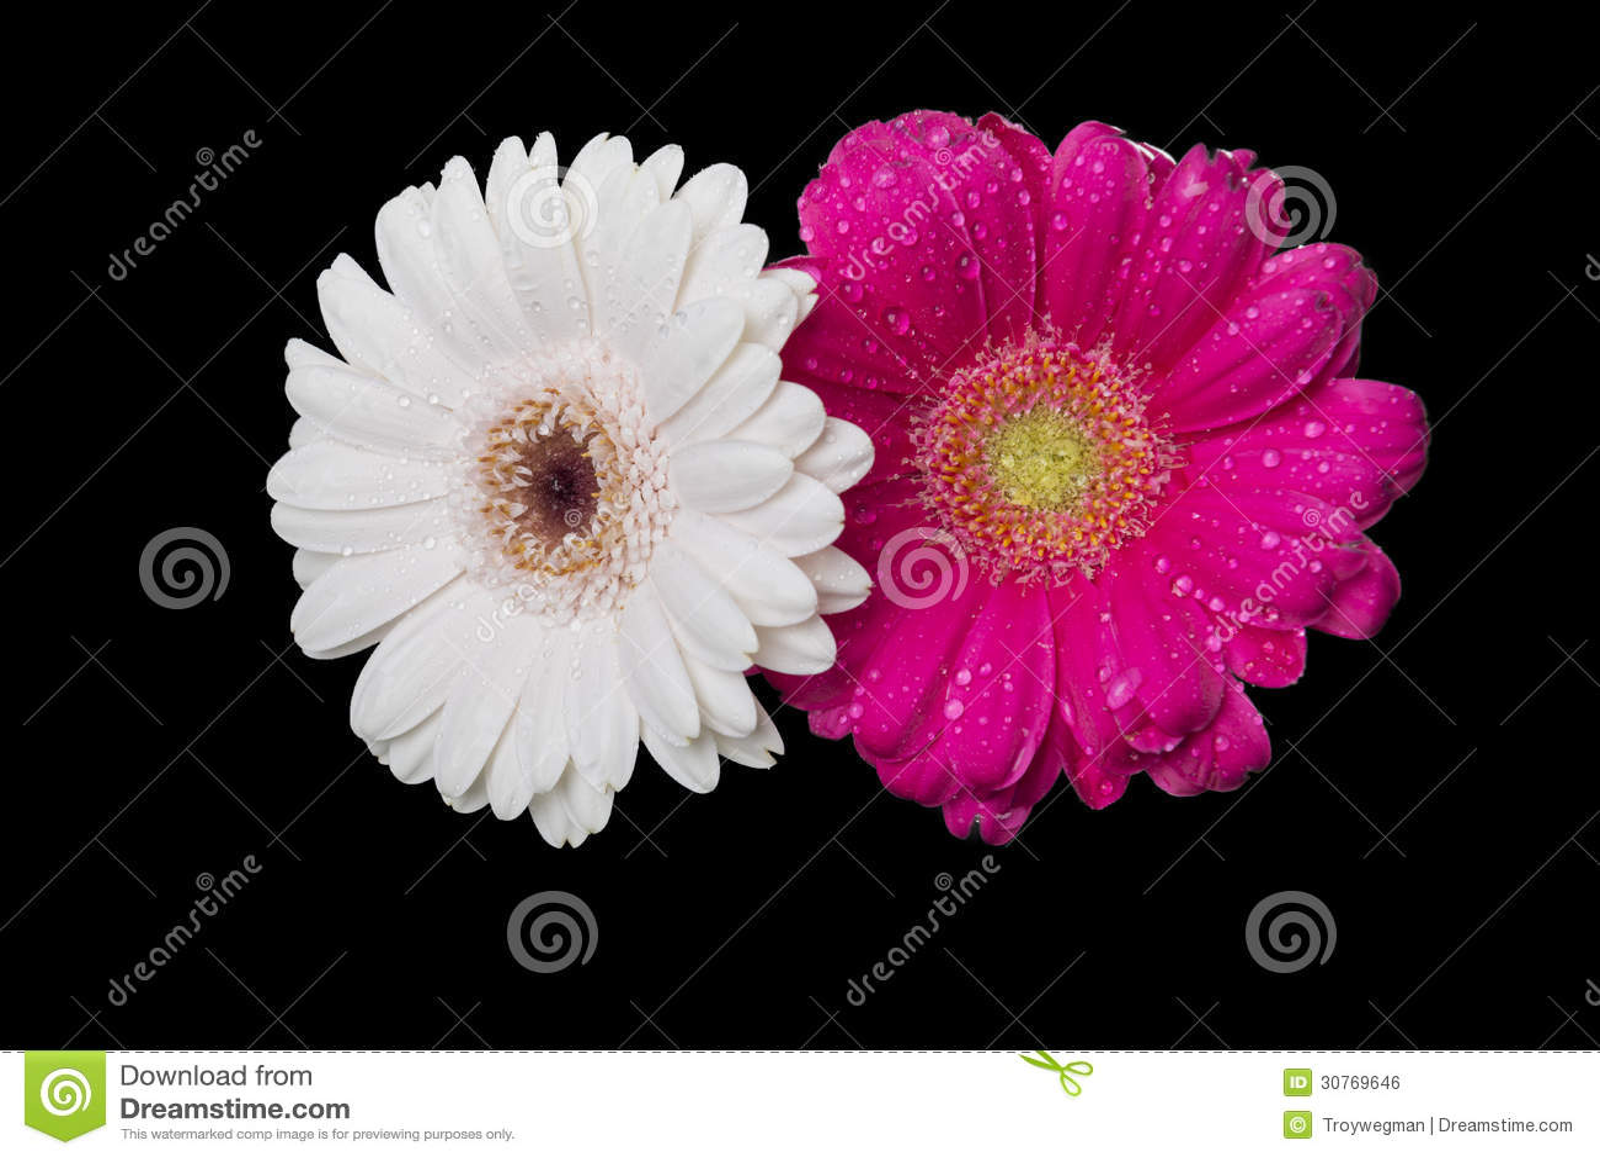 Wet Flowers Royalty Free Stock Image - Image: 30769646